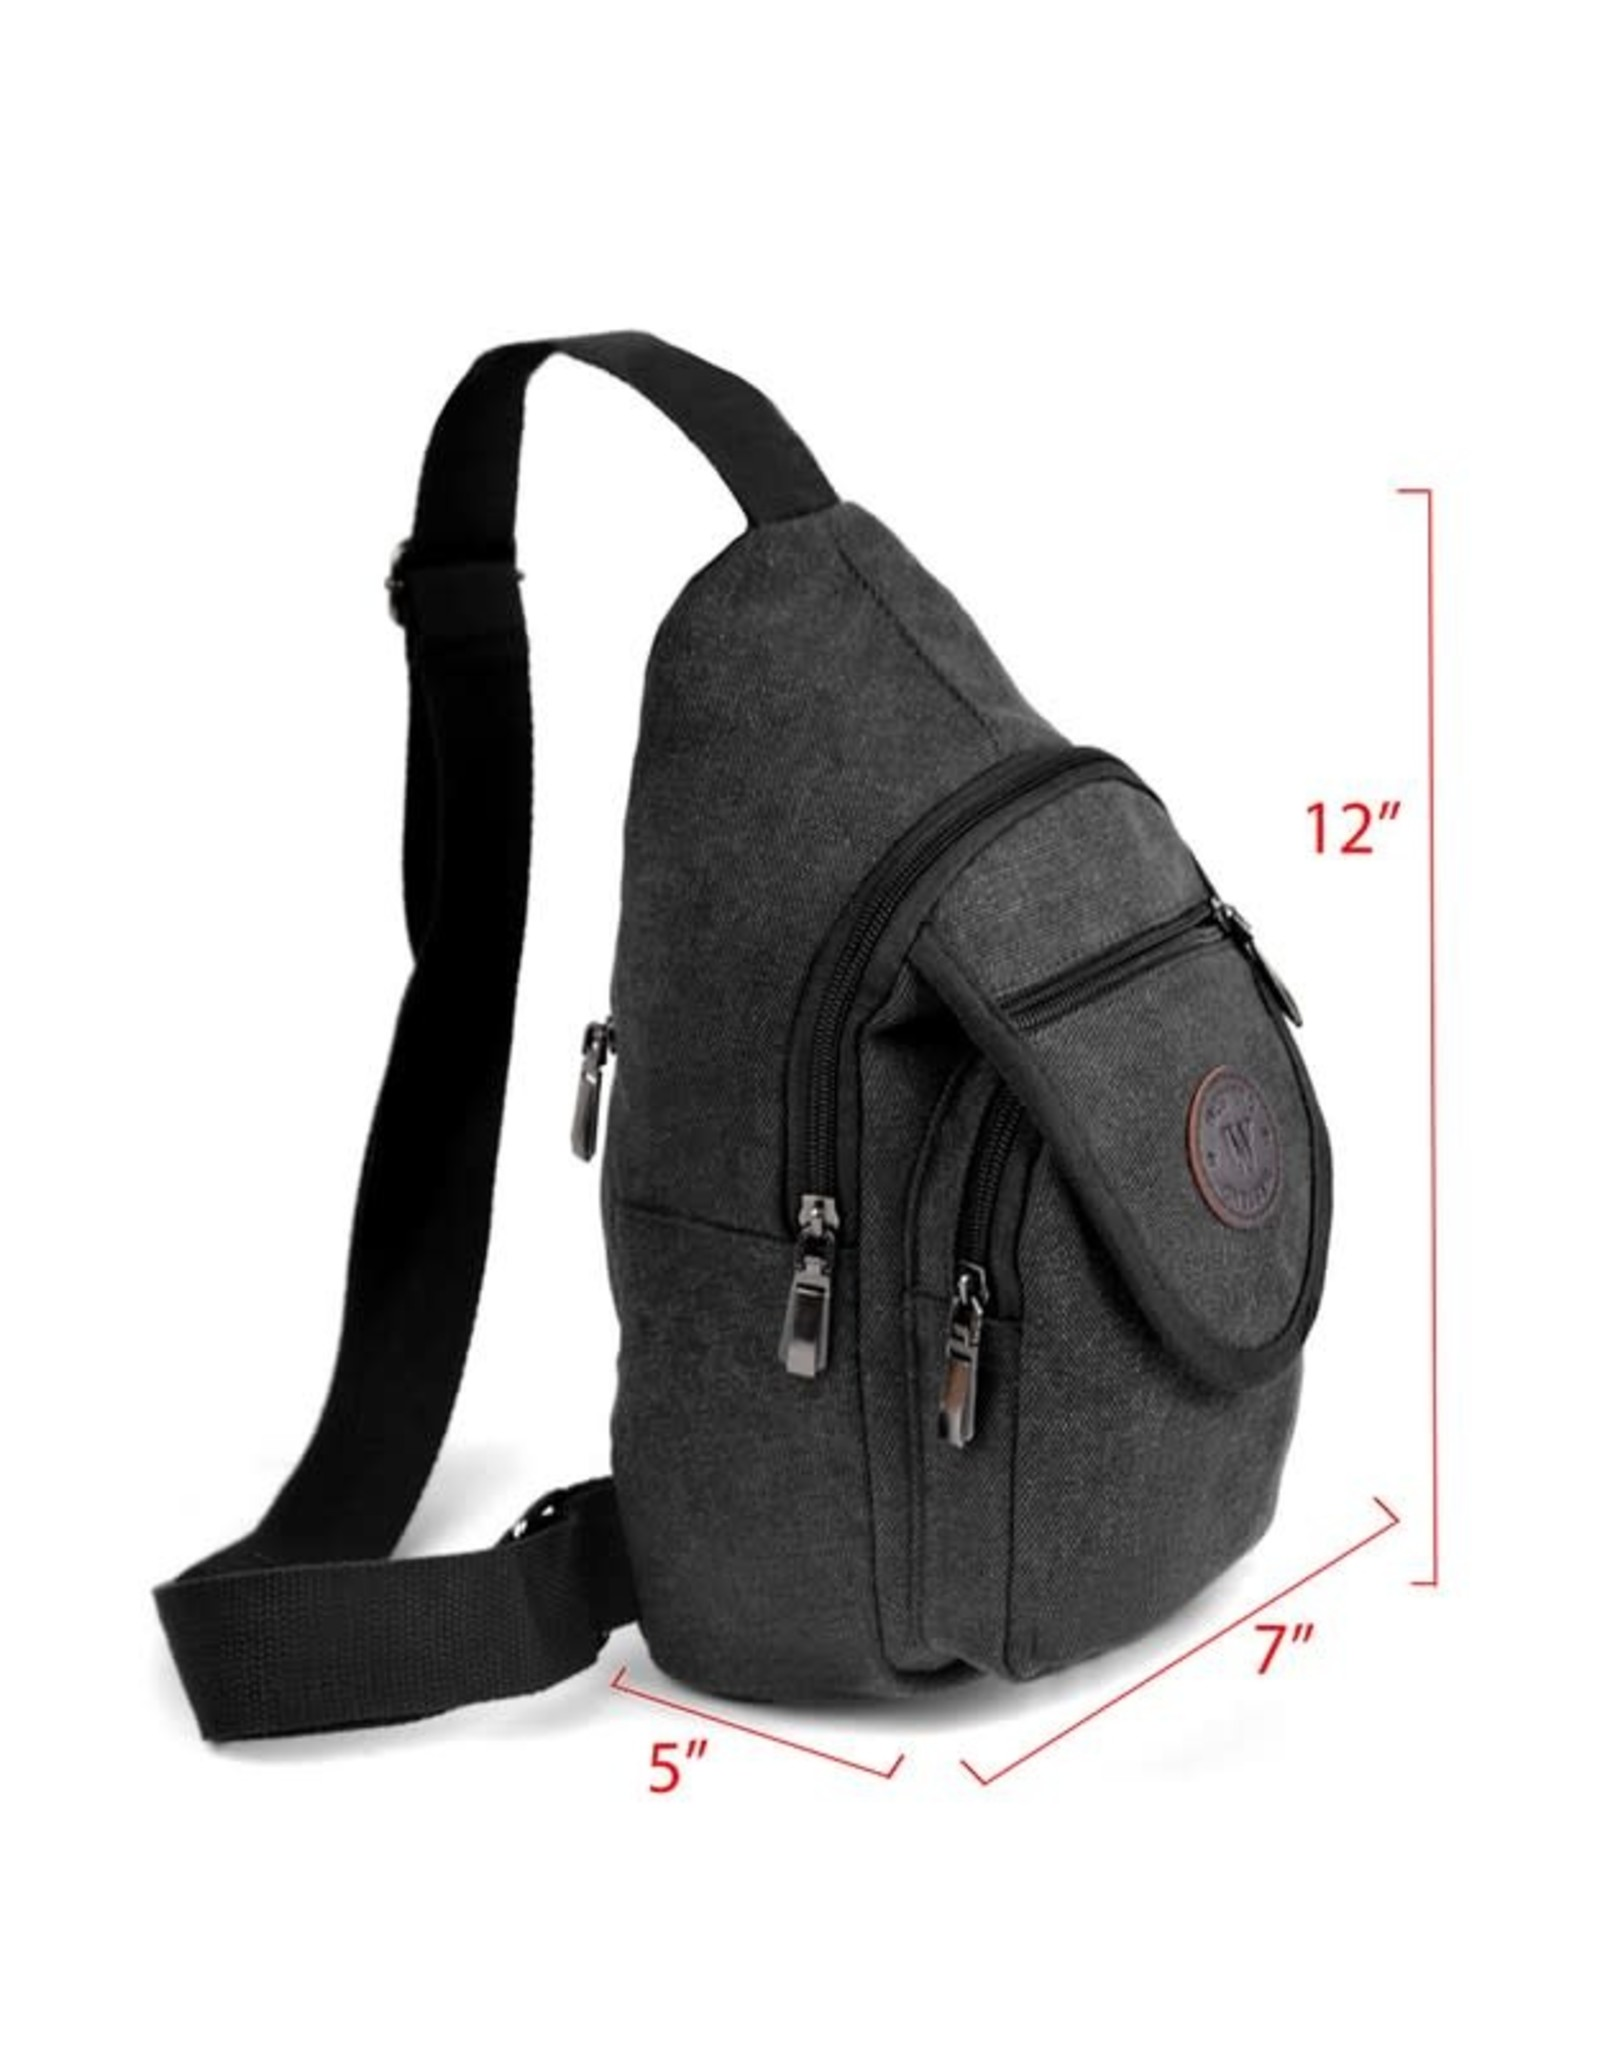 Cross bodyCanvas Sling Bag Backpack